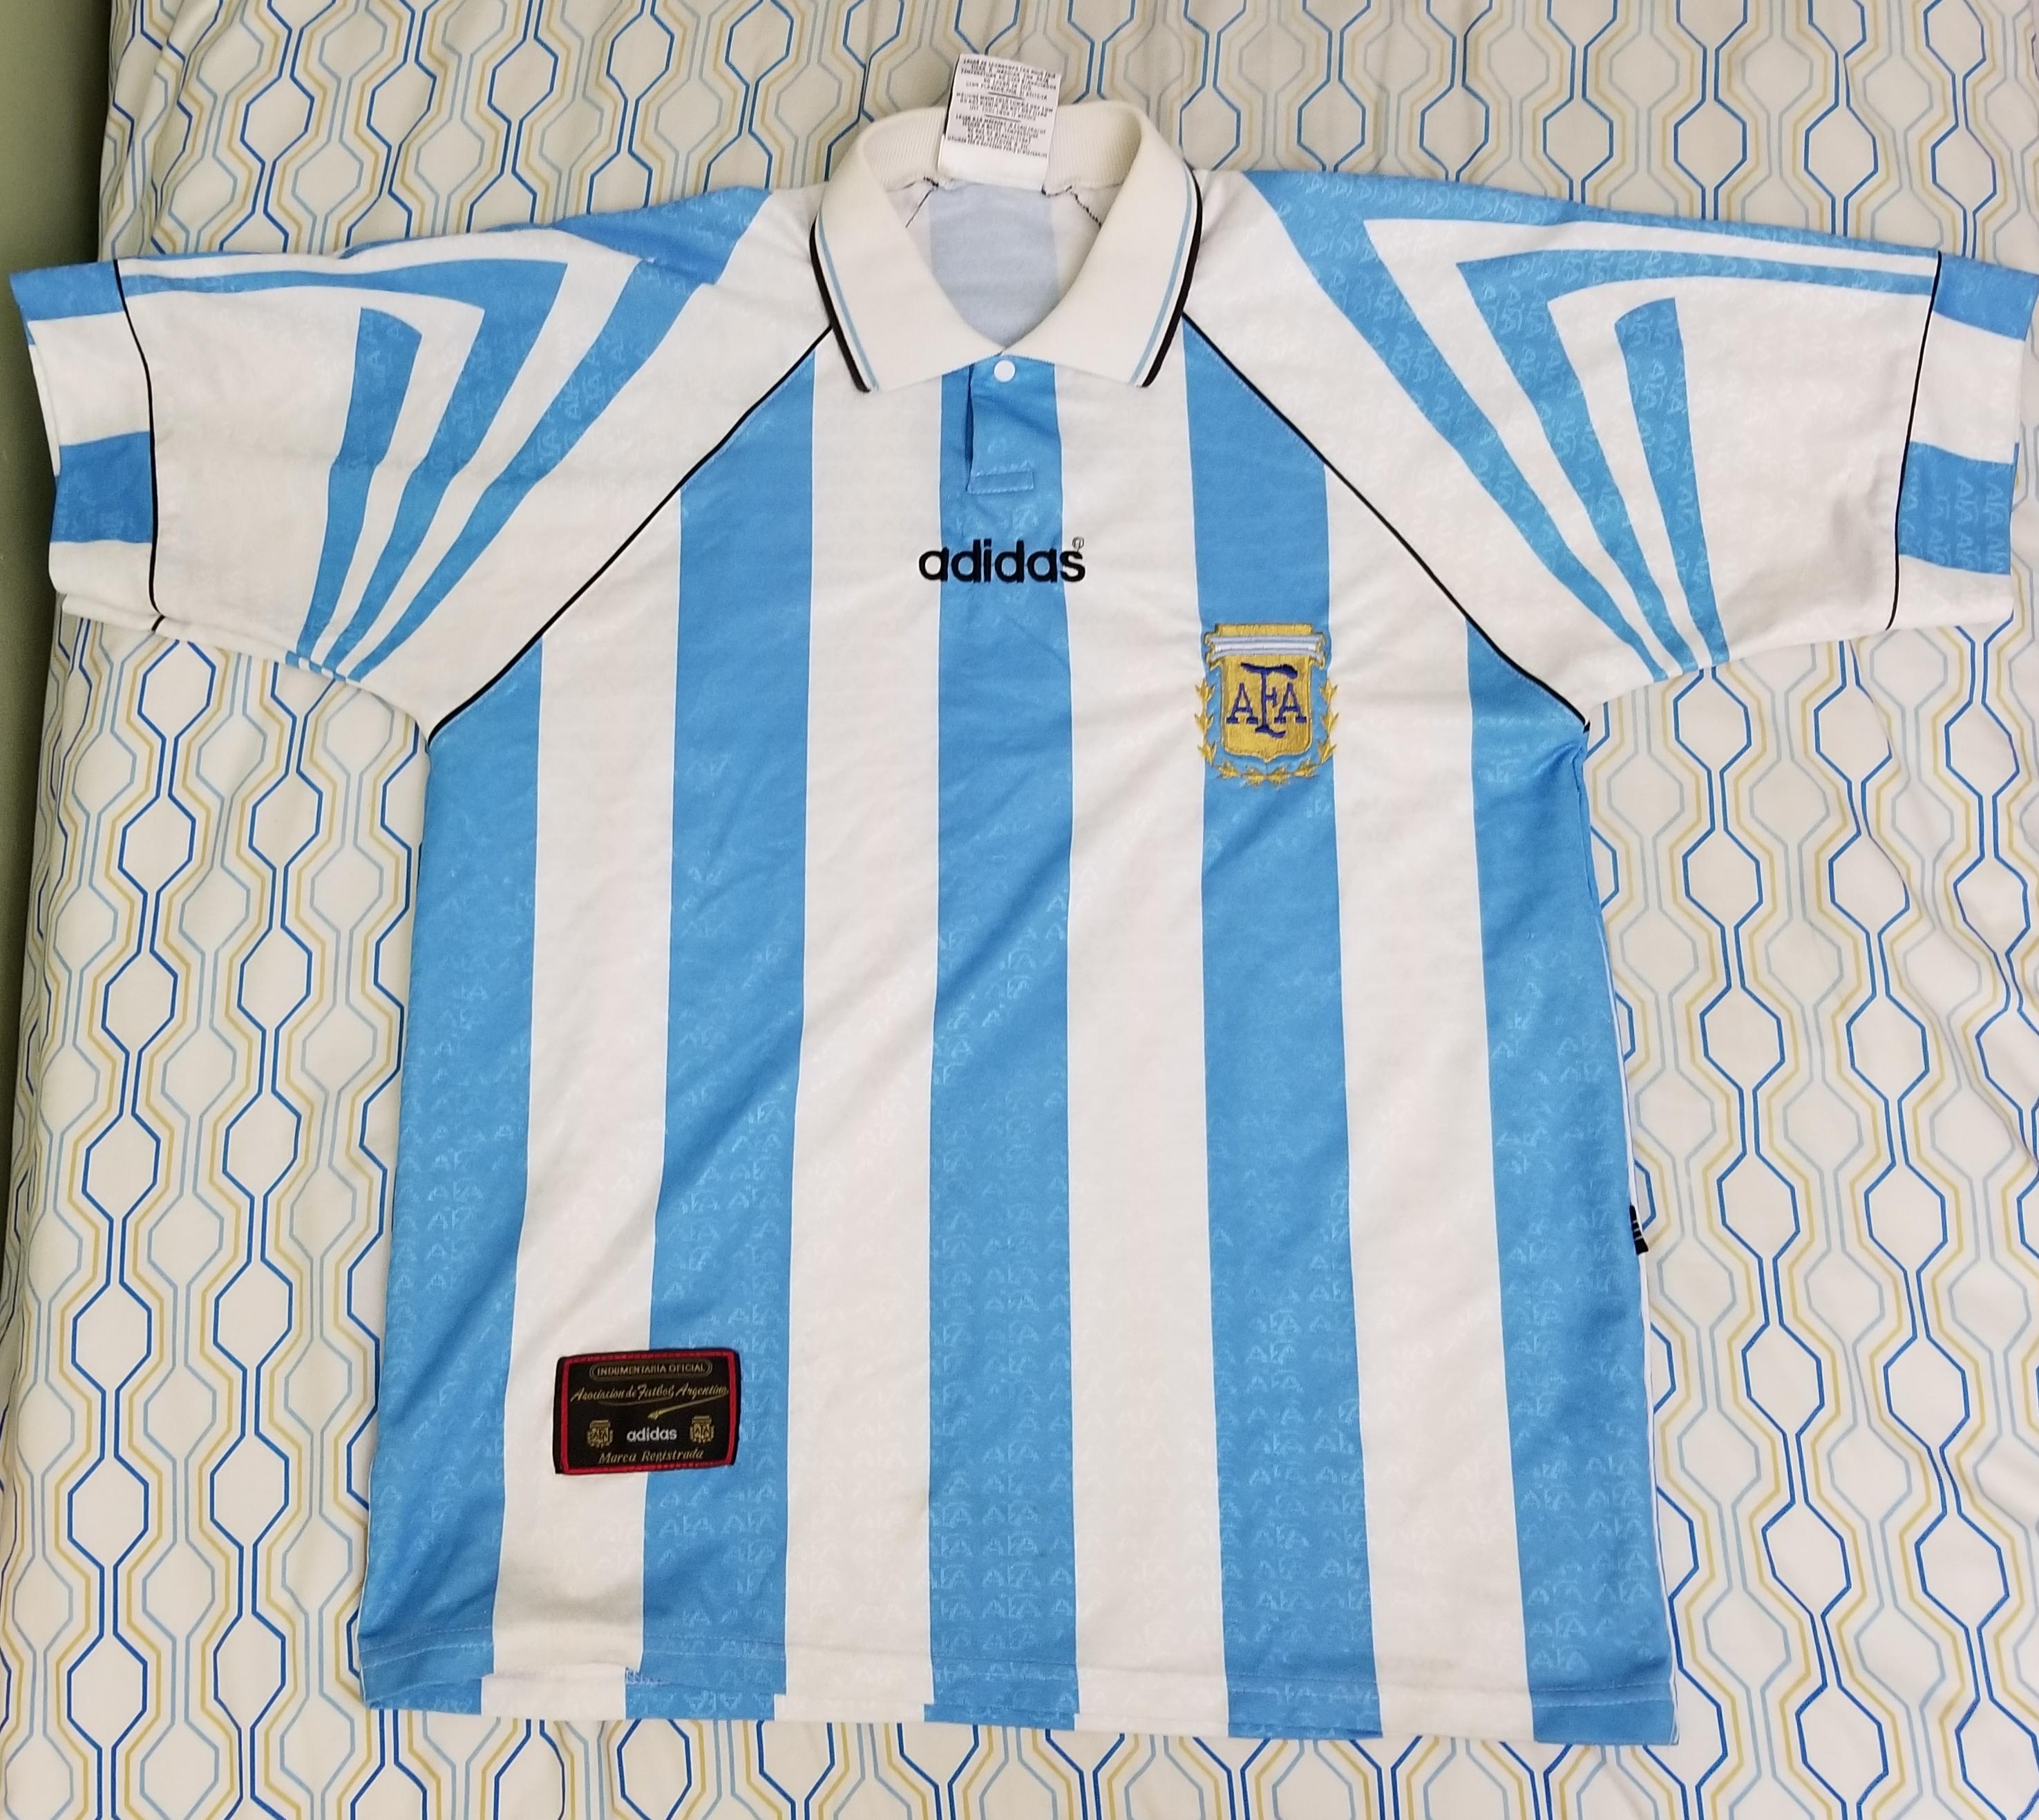 Adidas Vintage 90s 1996 1997 Adidas Argentina AFA Soccer Jersey